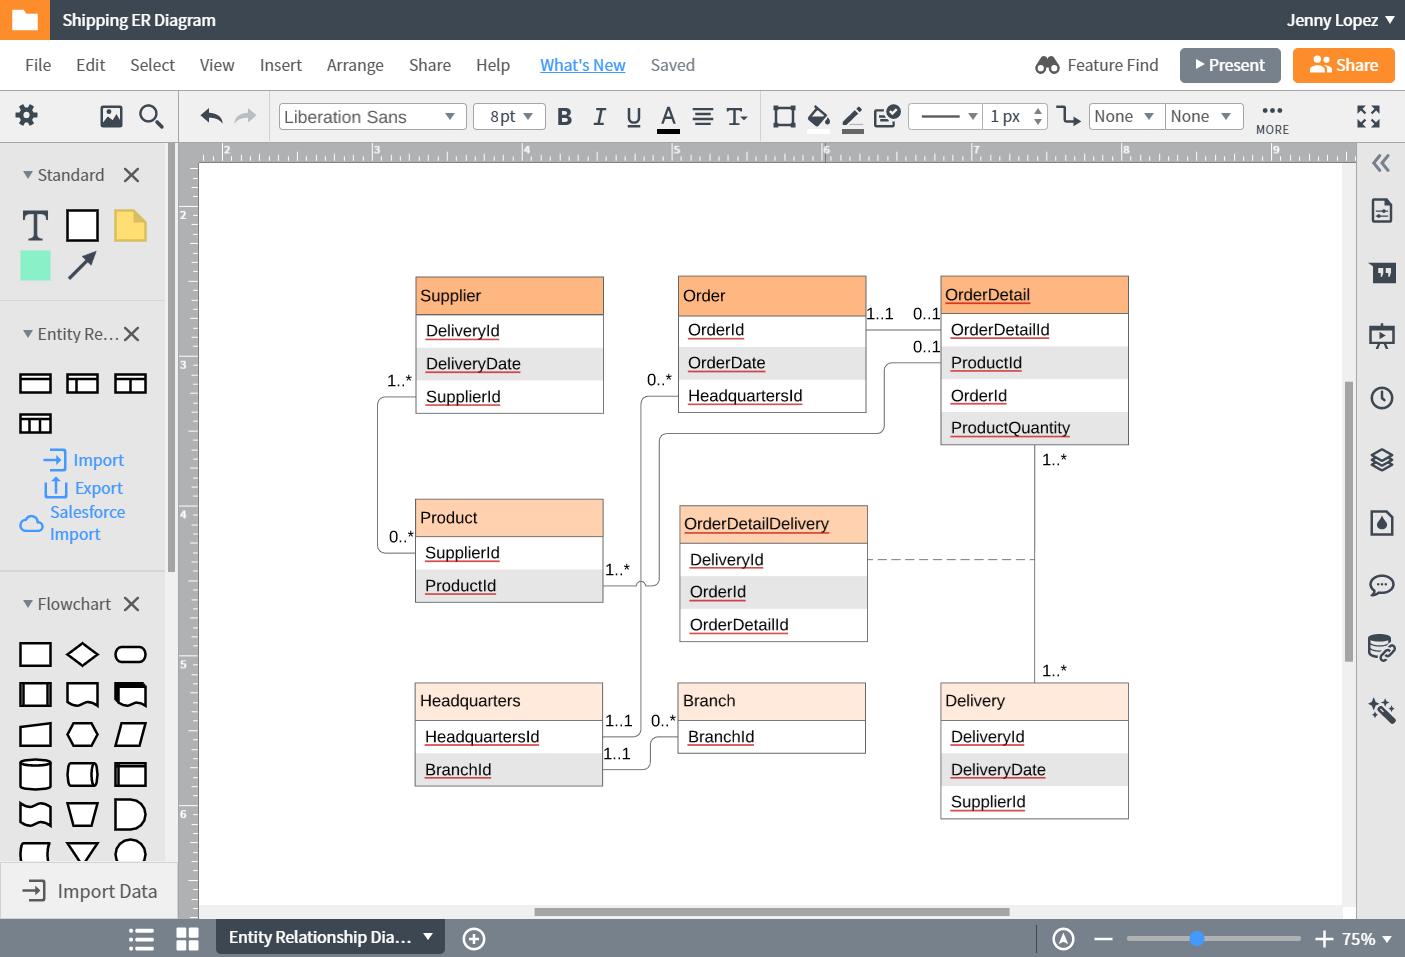 Er Diagram (Erd) Tool | Lucidchart within Erd Tool